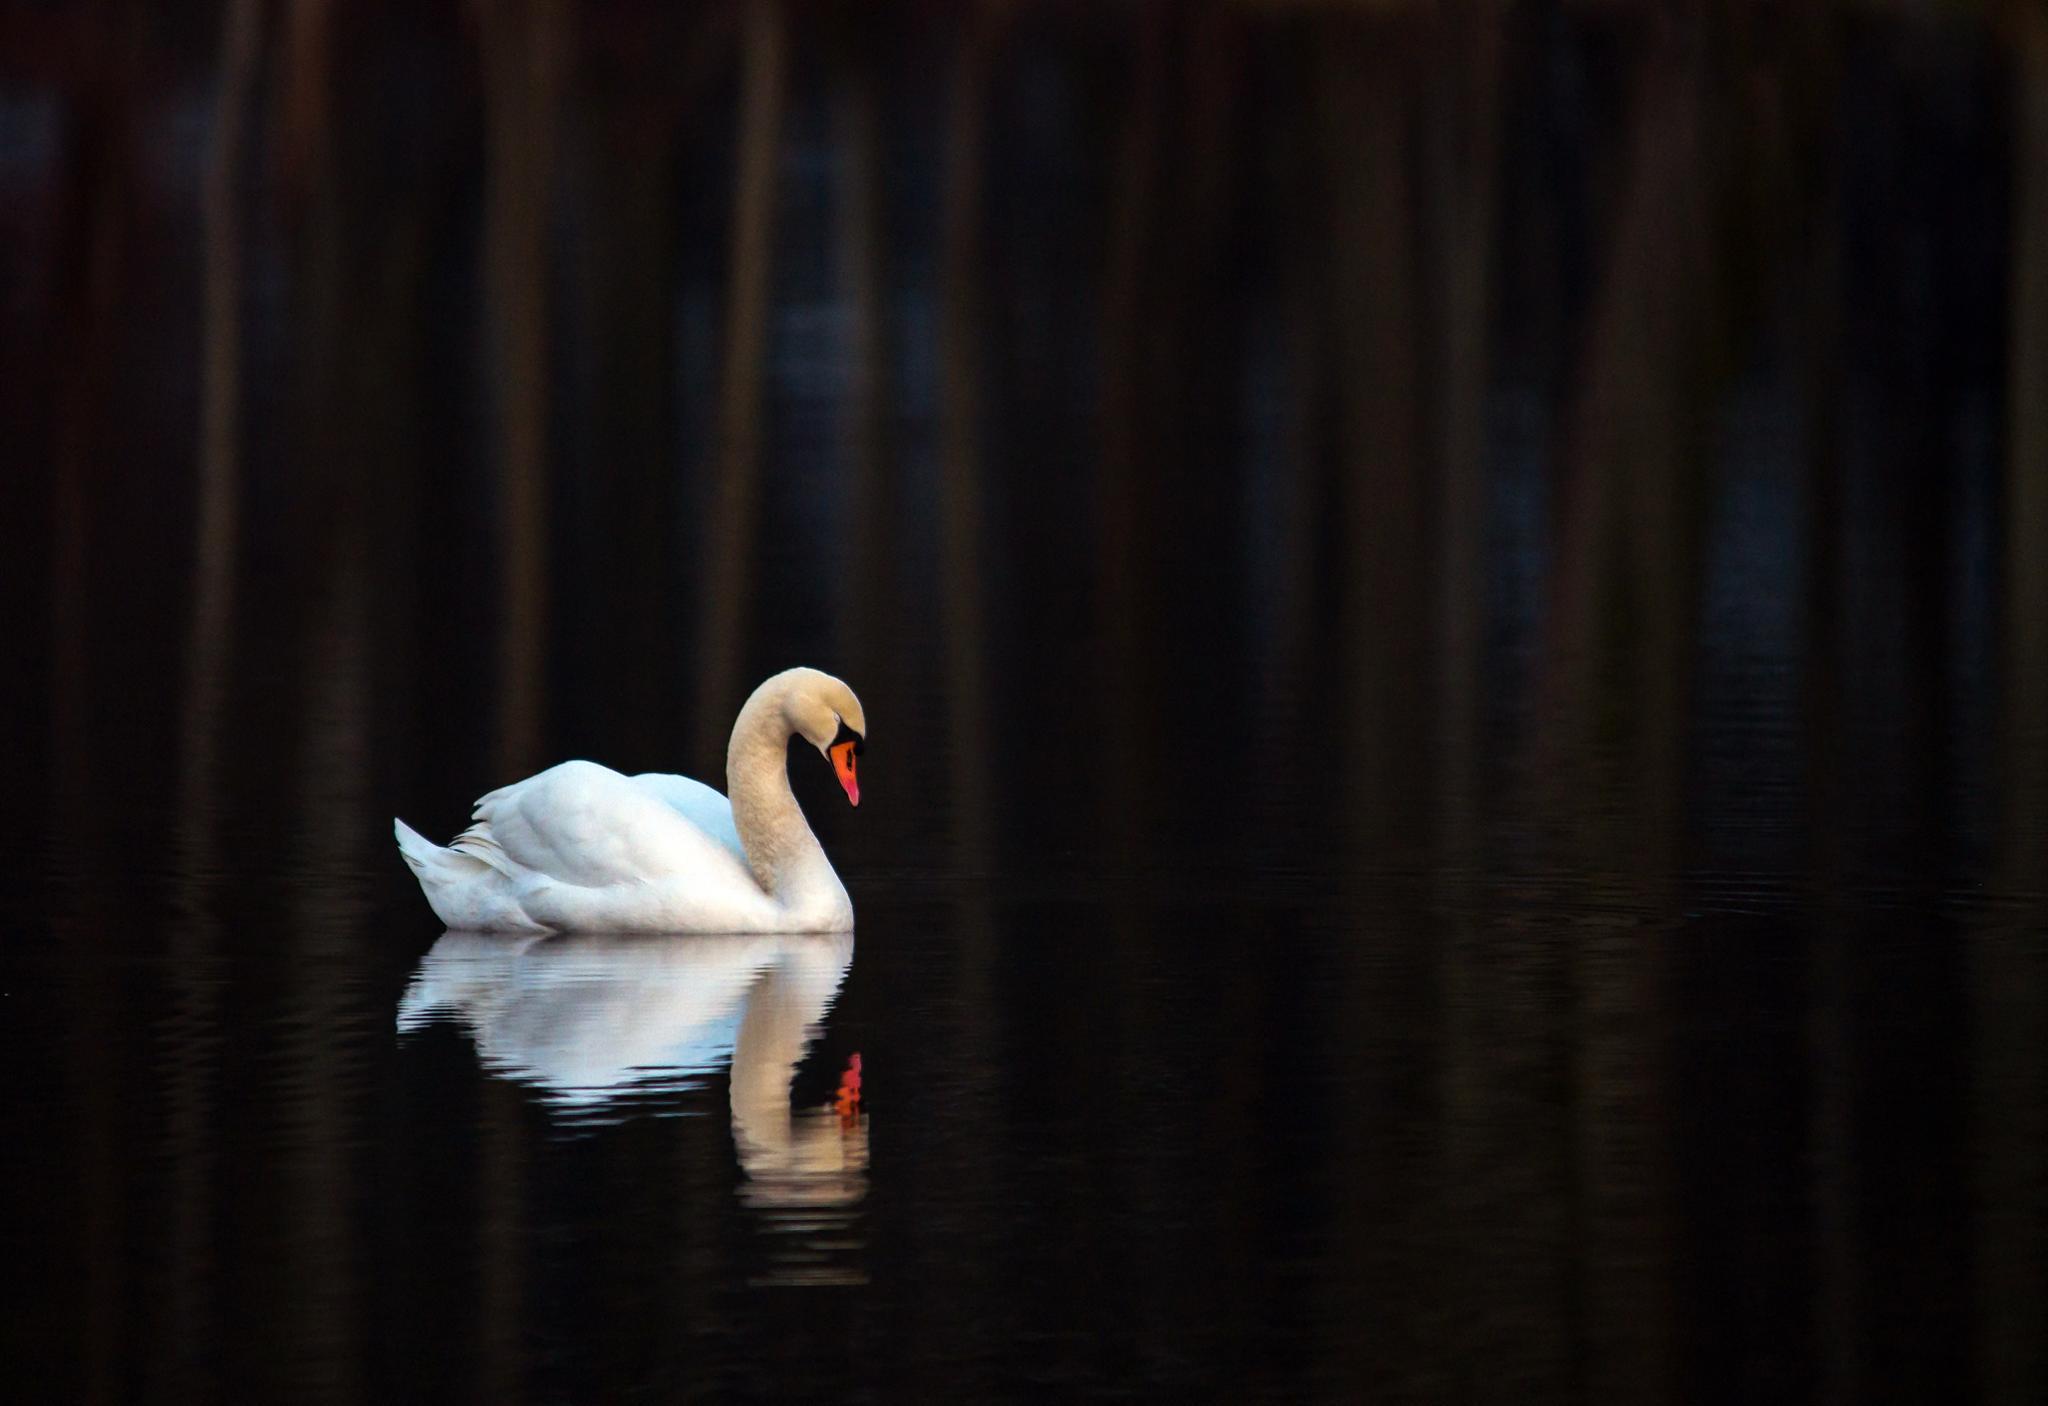 Dreaming swan by Zoran Rudec